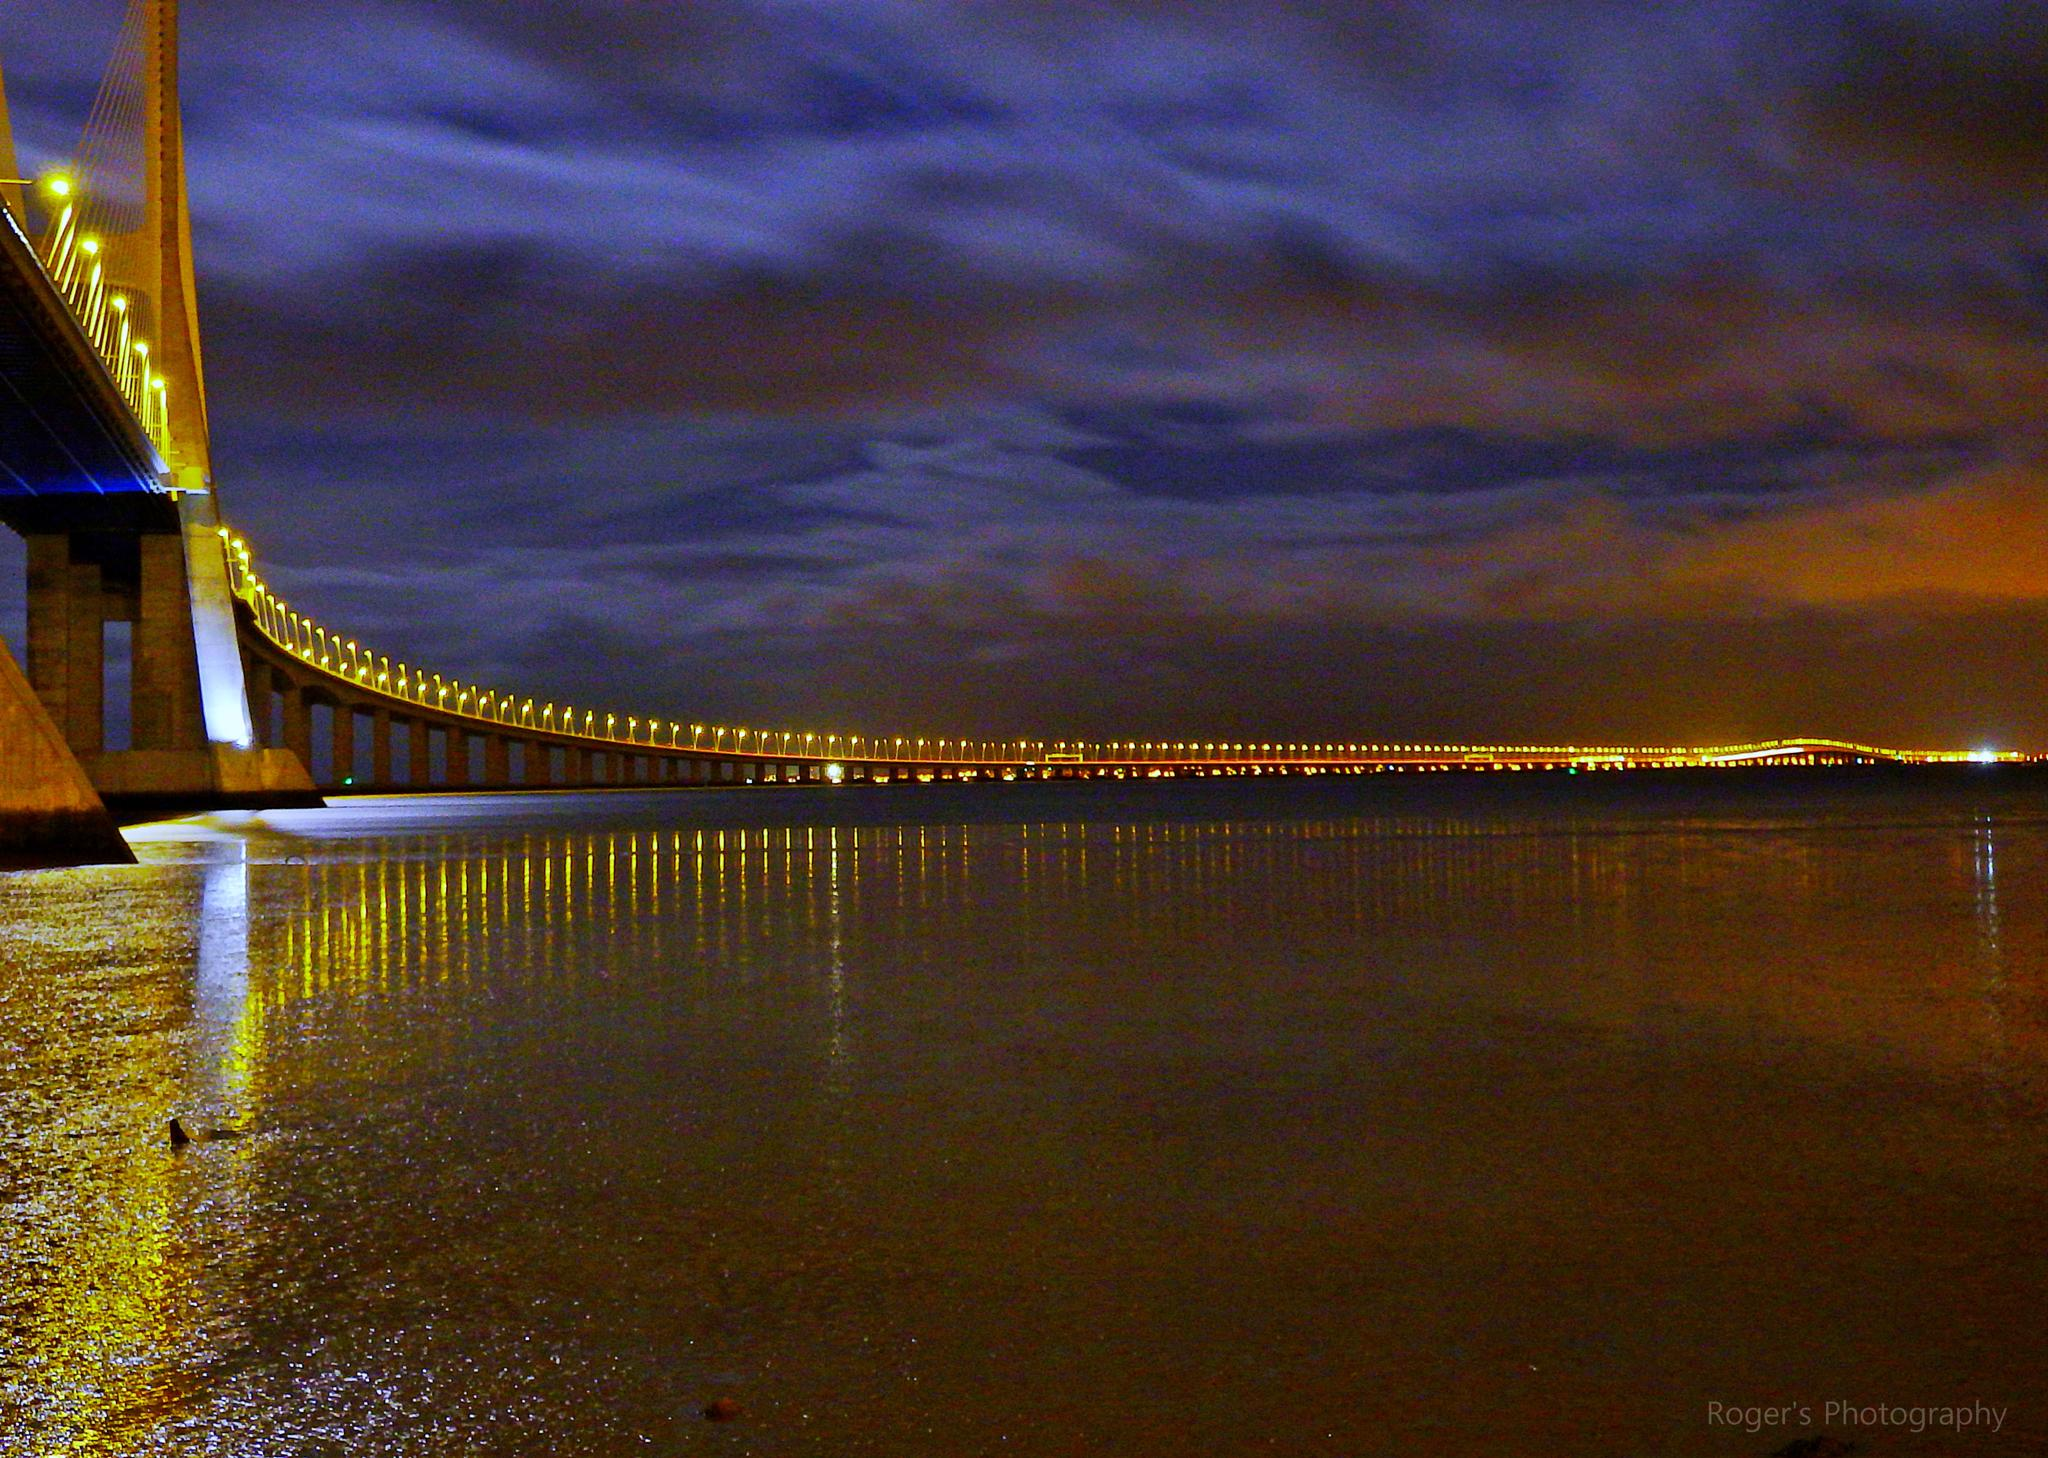 Ponte Vasco da Gama by Roger Photography